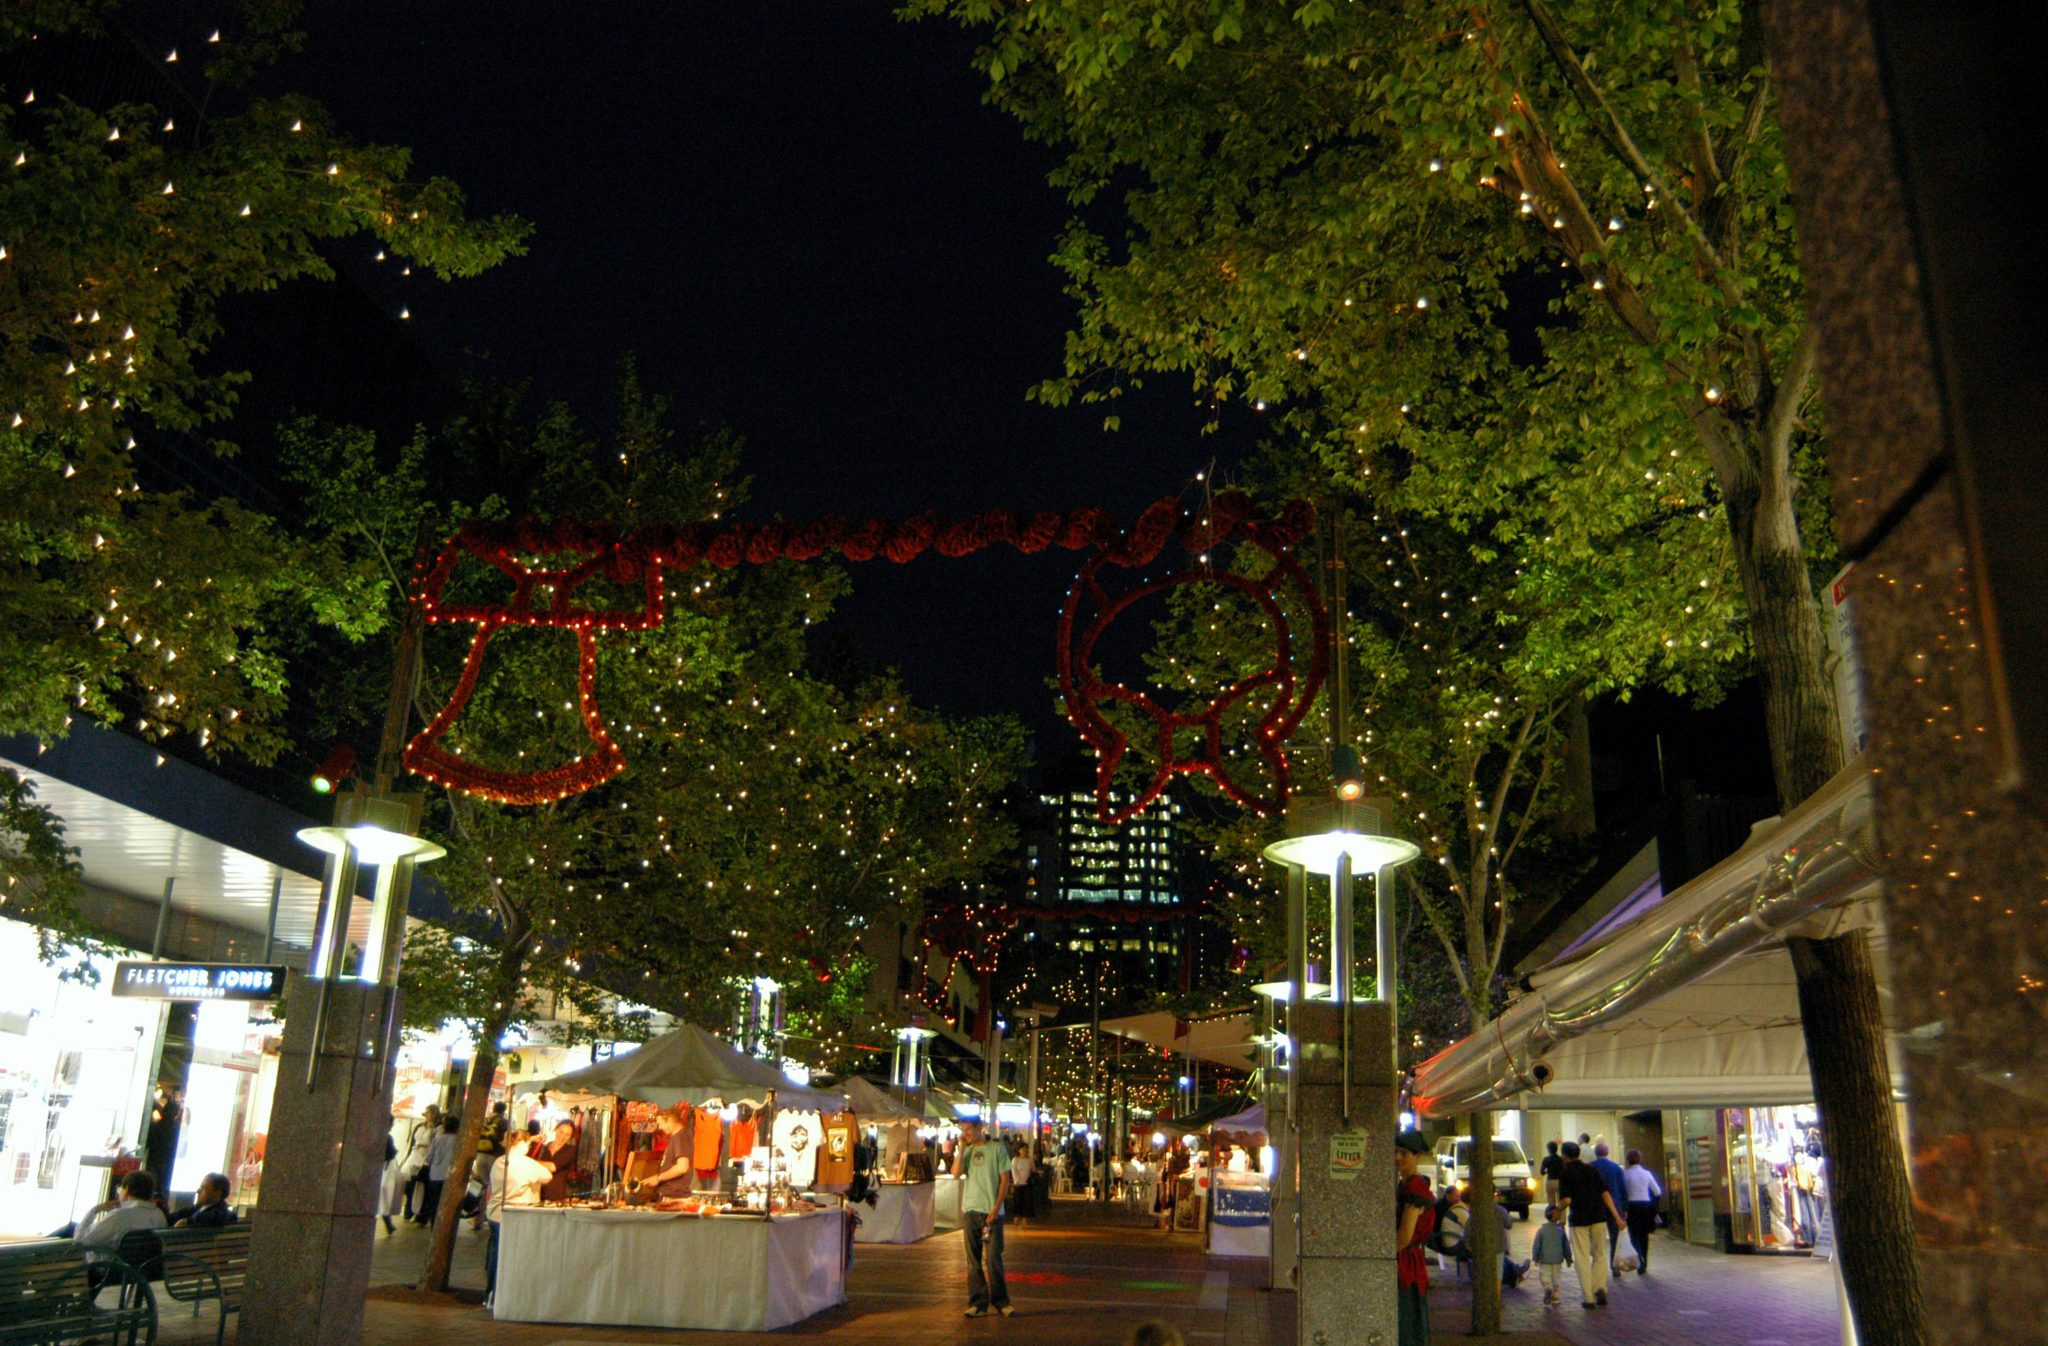 Chatswood Mall decoration and lighting for Christmas